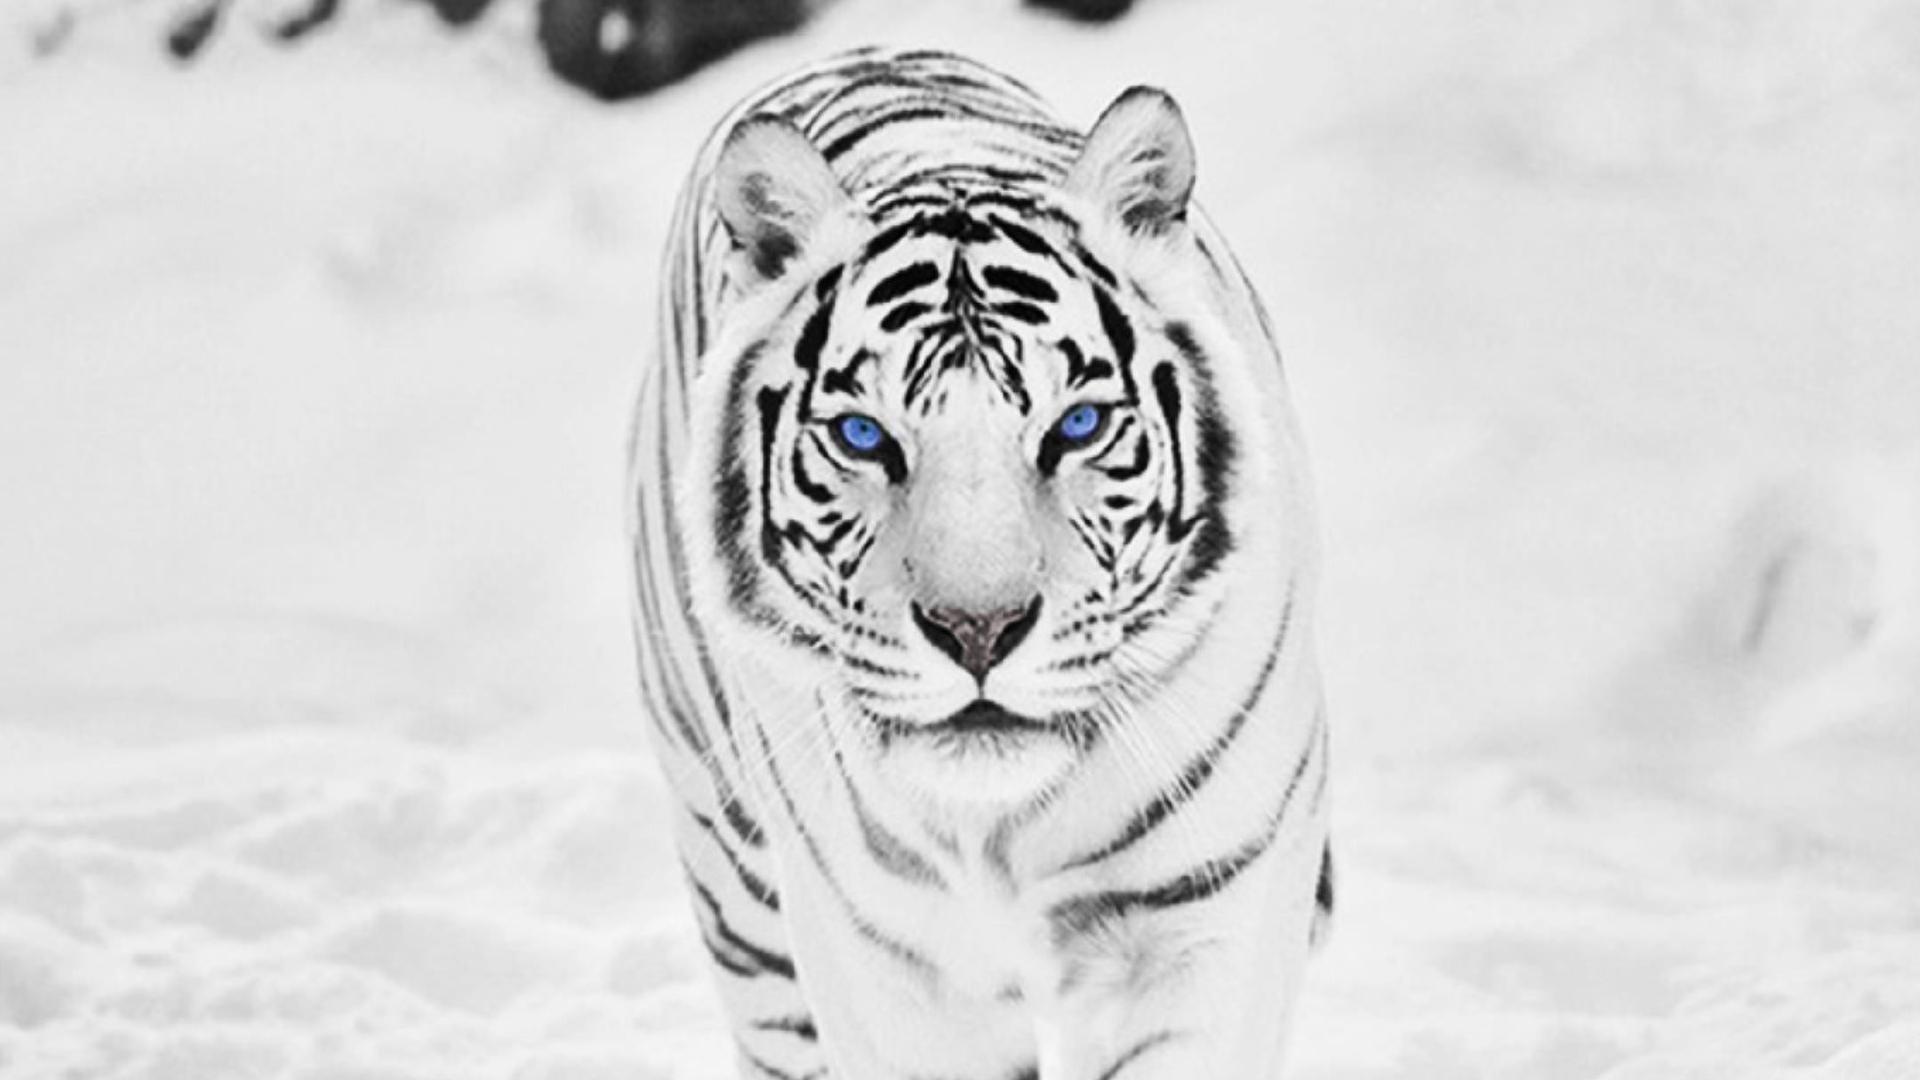 white tiger wallpapers, 49 desktop images of white tiger | white